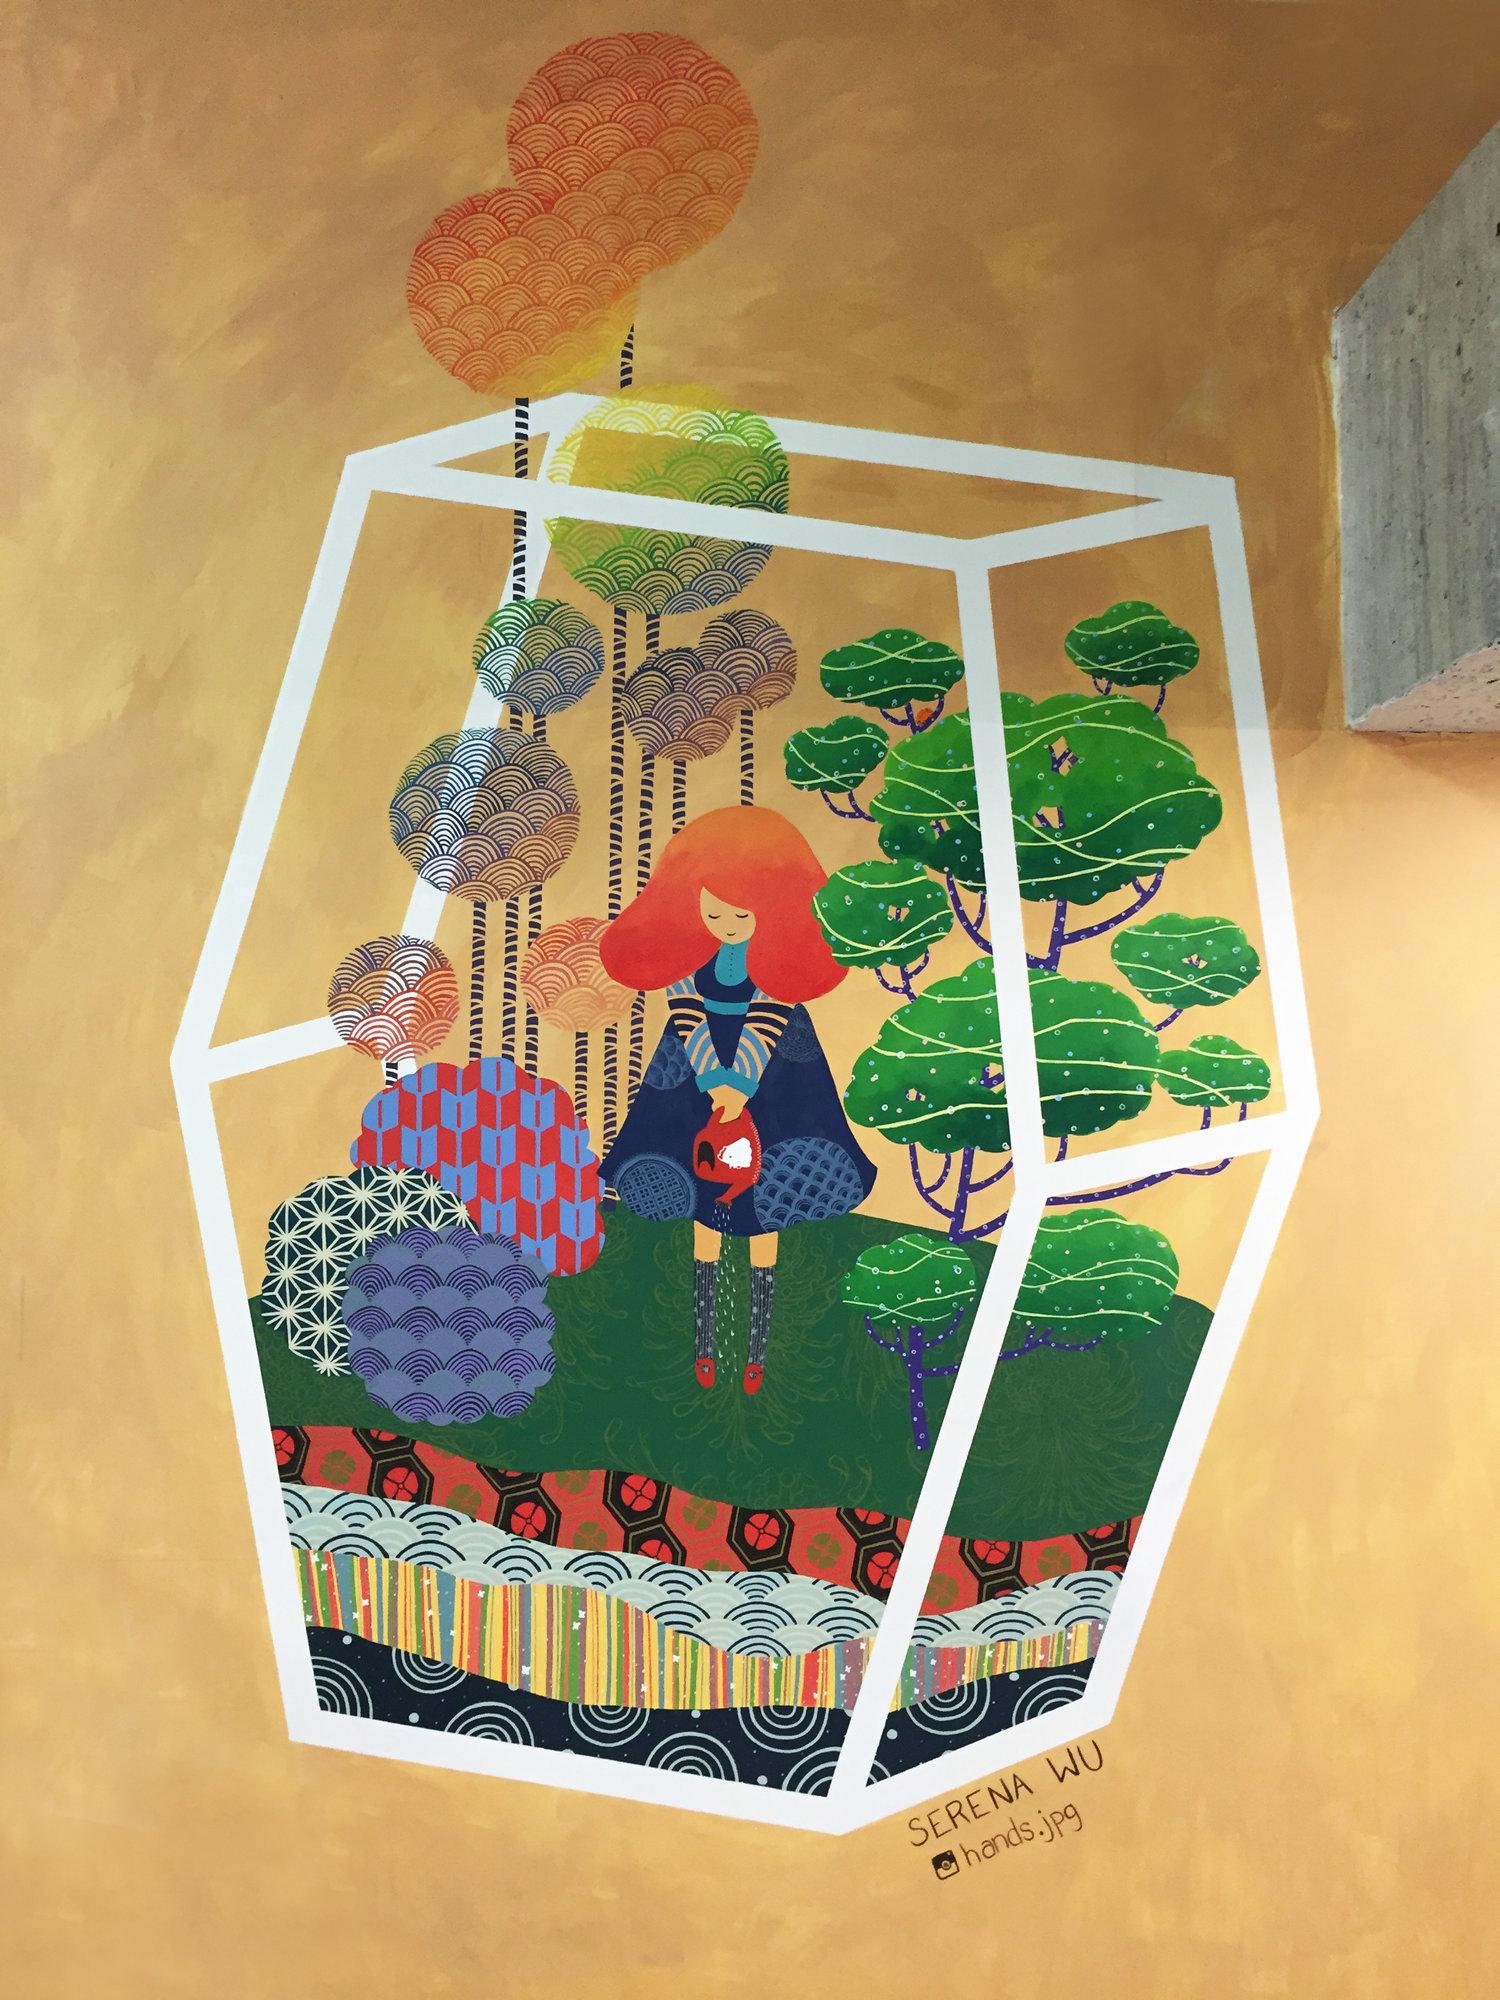 Home Sweet Home - Mural for Brooklyn Boulders Queensbridge (2016)